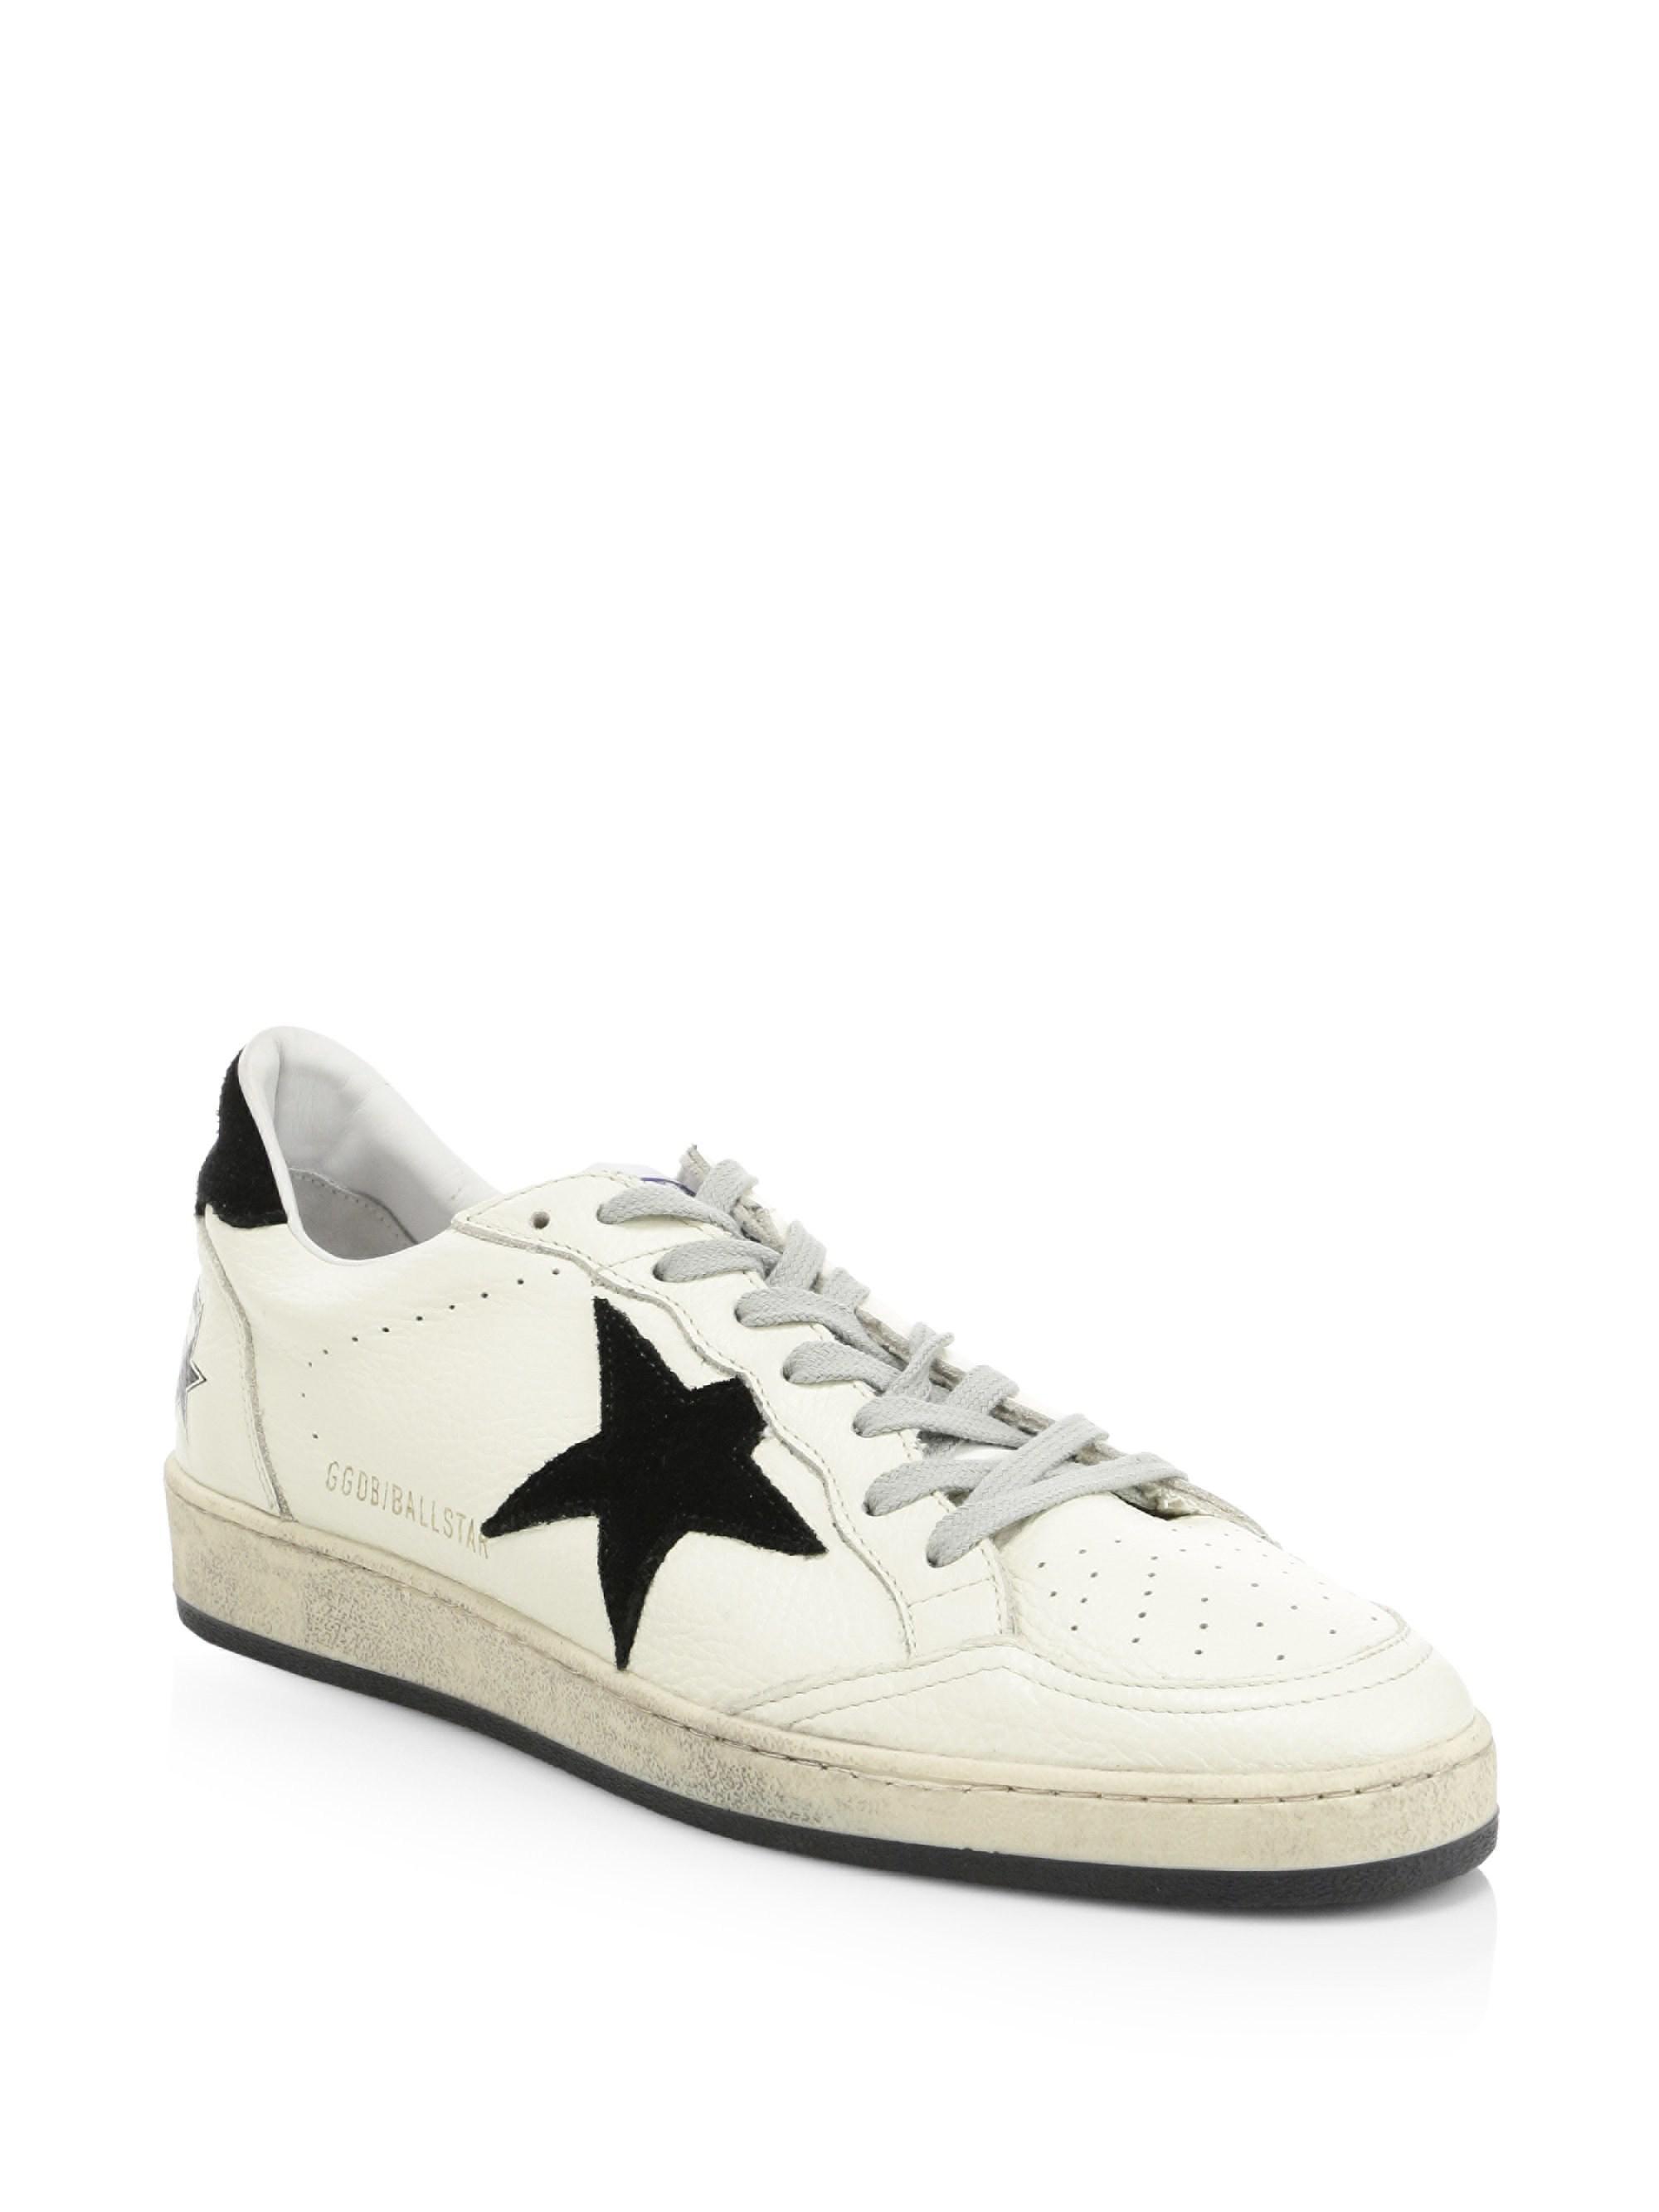 91e6a152b34cf Lyst - Golden Goose Deluxe Brand Ballstar Leather Sneakers for Men